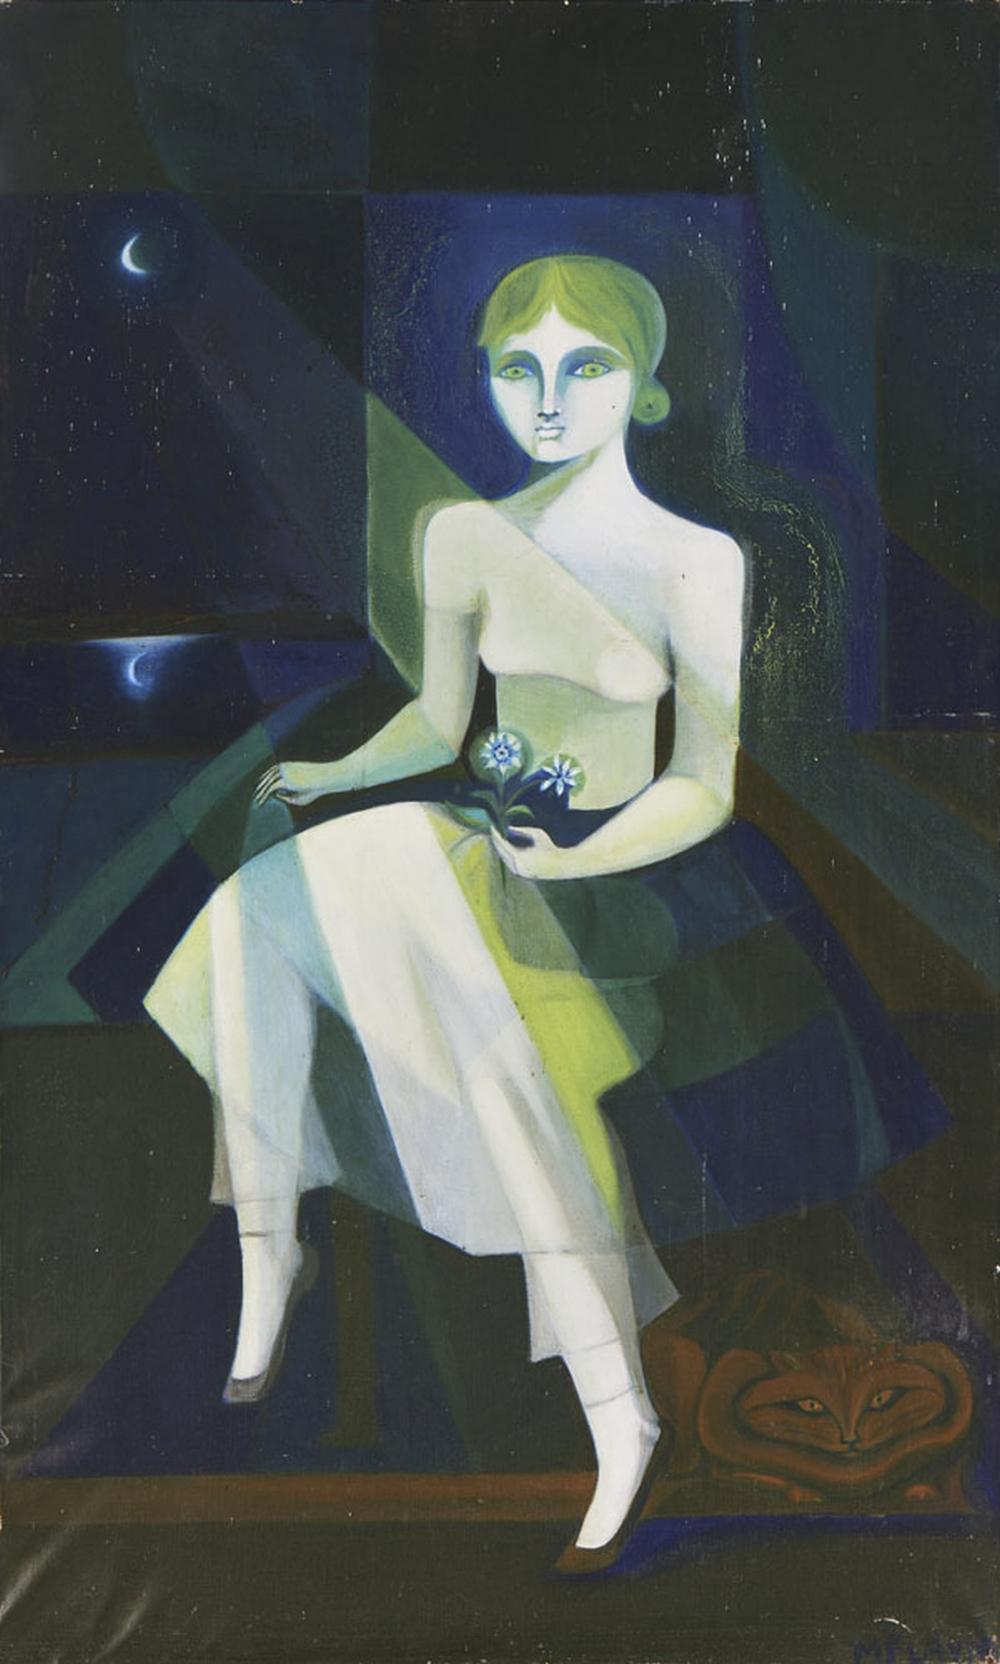 FLÁVIA MONSARAZ, Óleo s/ tela, 13 x 80 cm